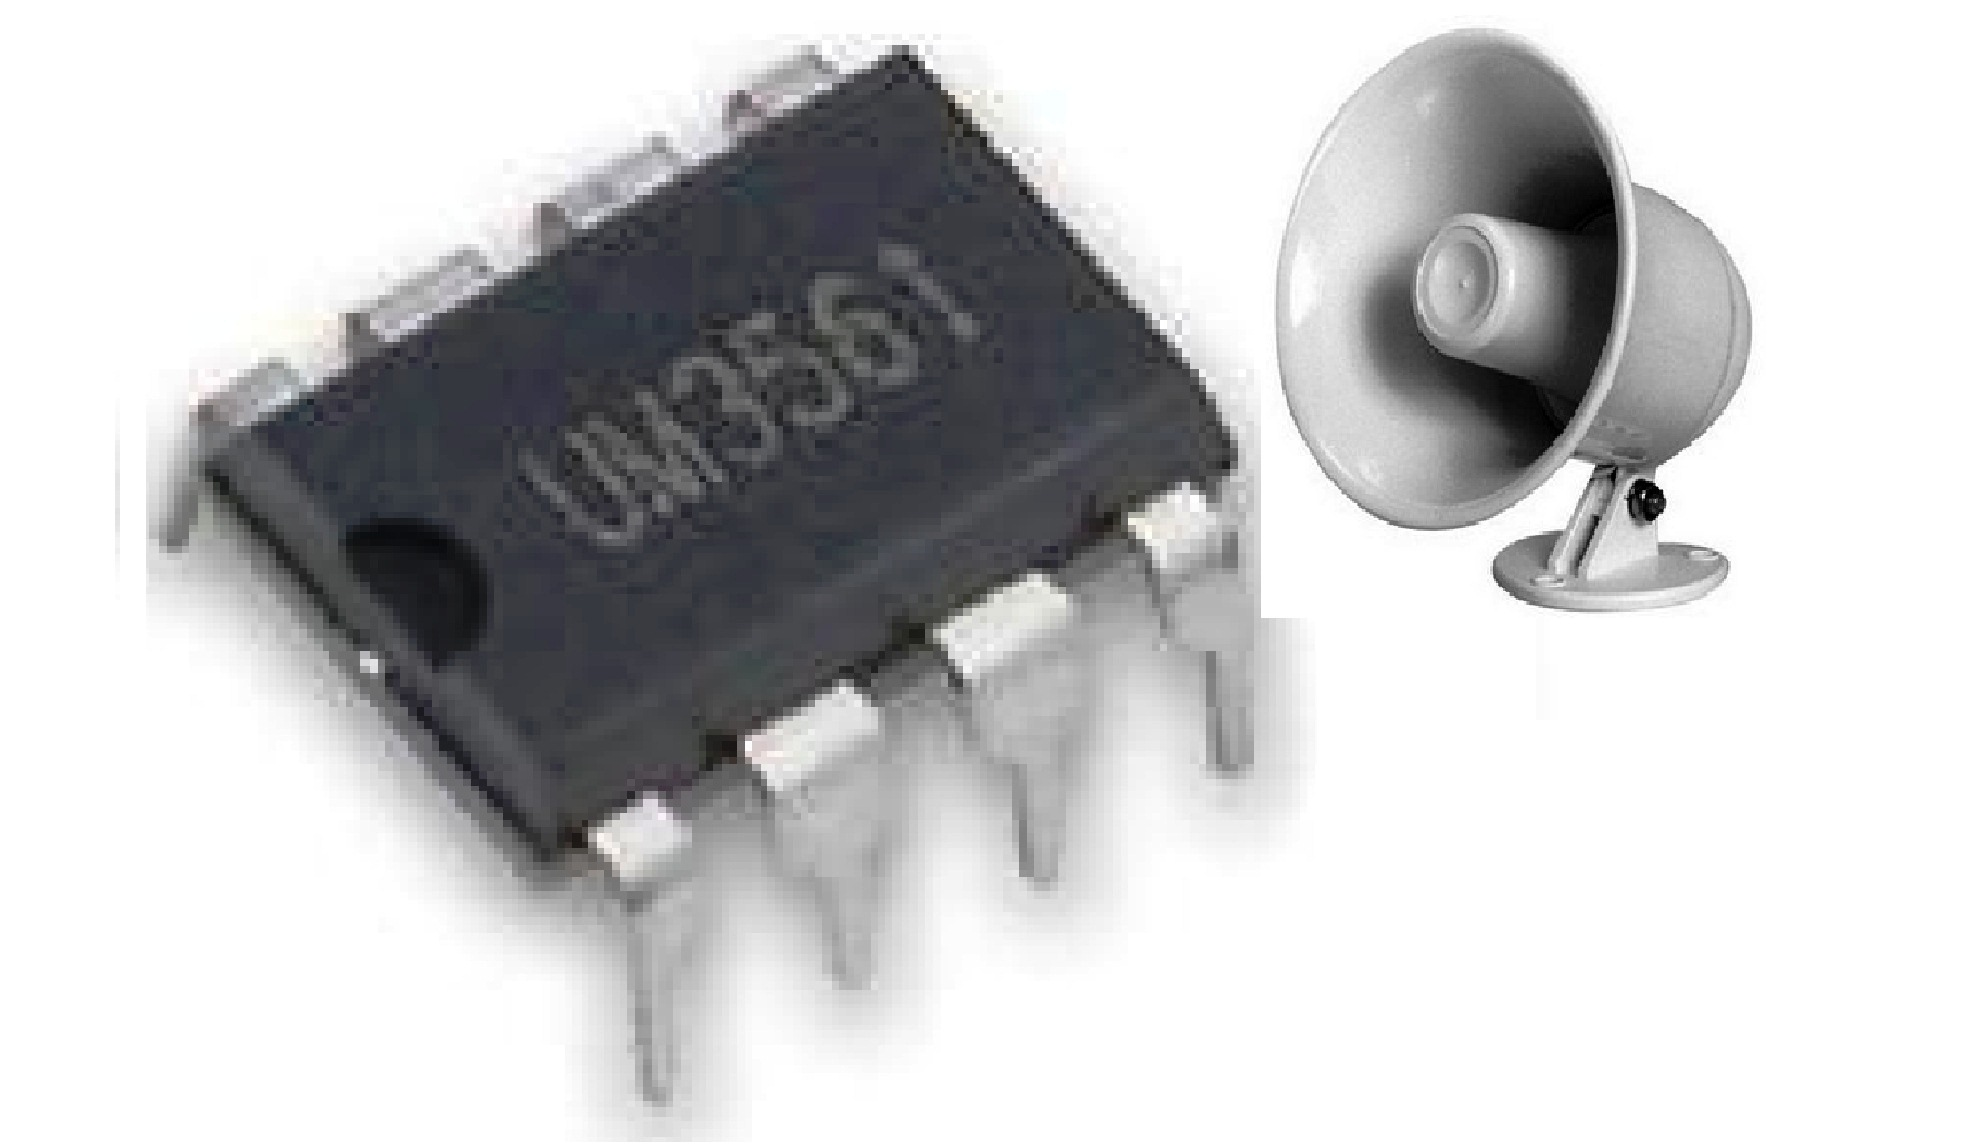 generator avr circuit diagram 2001 dodge ram wiring siren using ic um3561